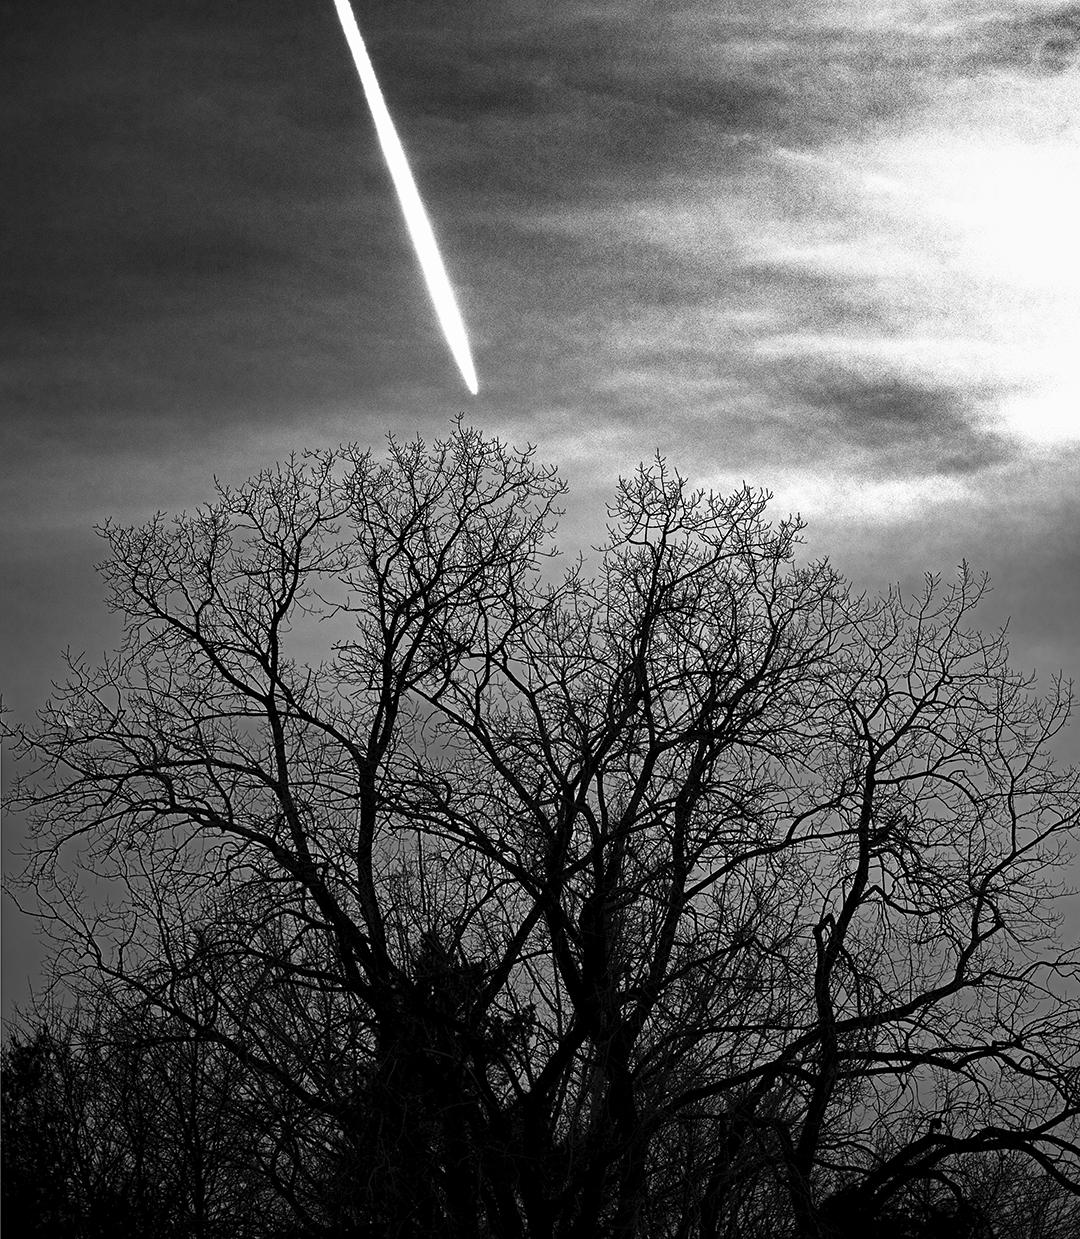 Plan and Tree + B&W.jpg